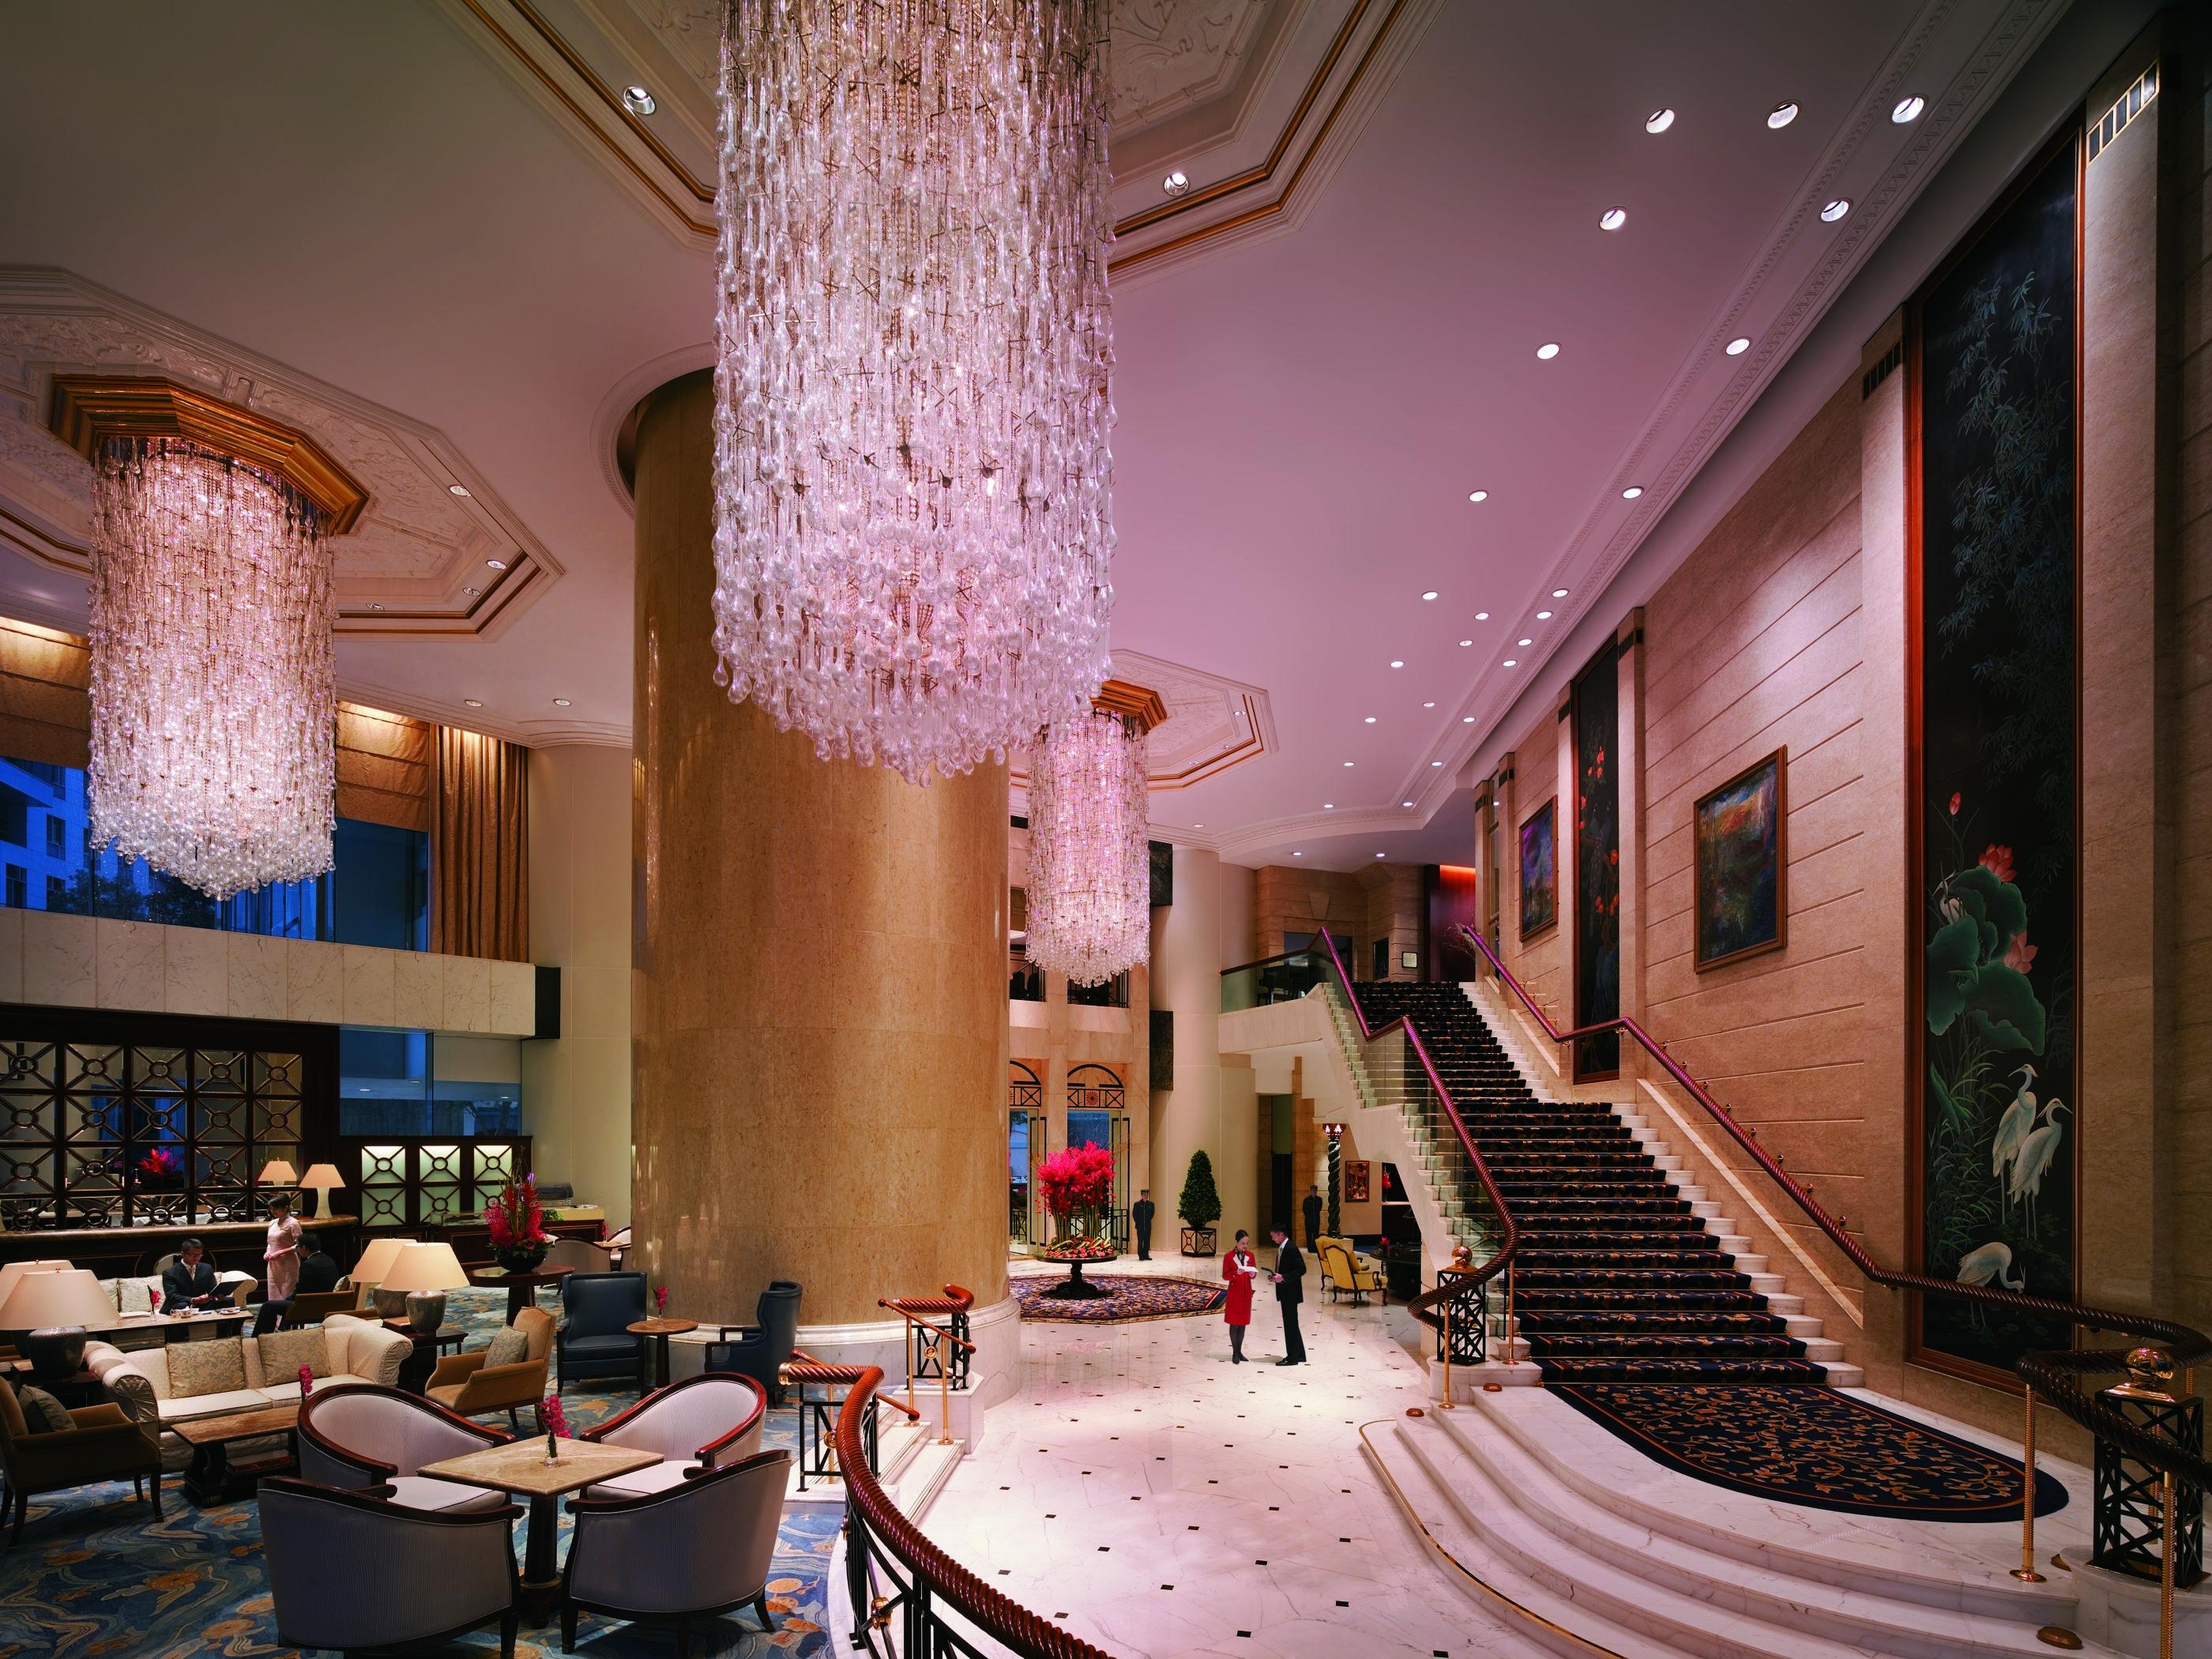 Best Hong Kong hotels: Island Shangri-la